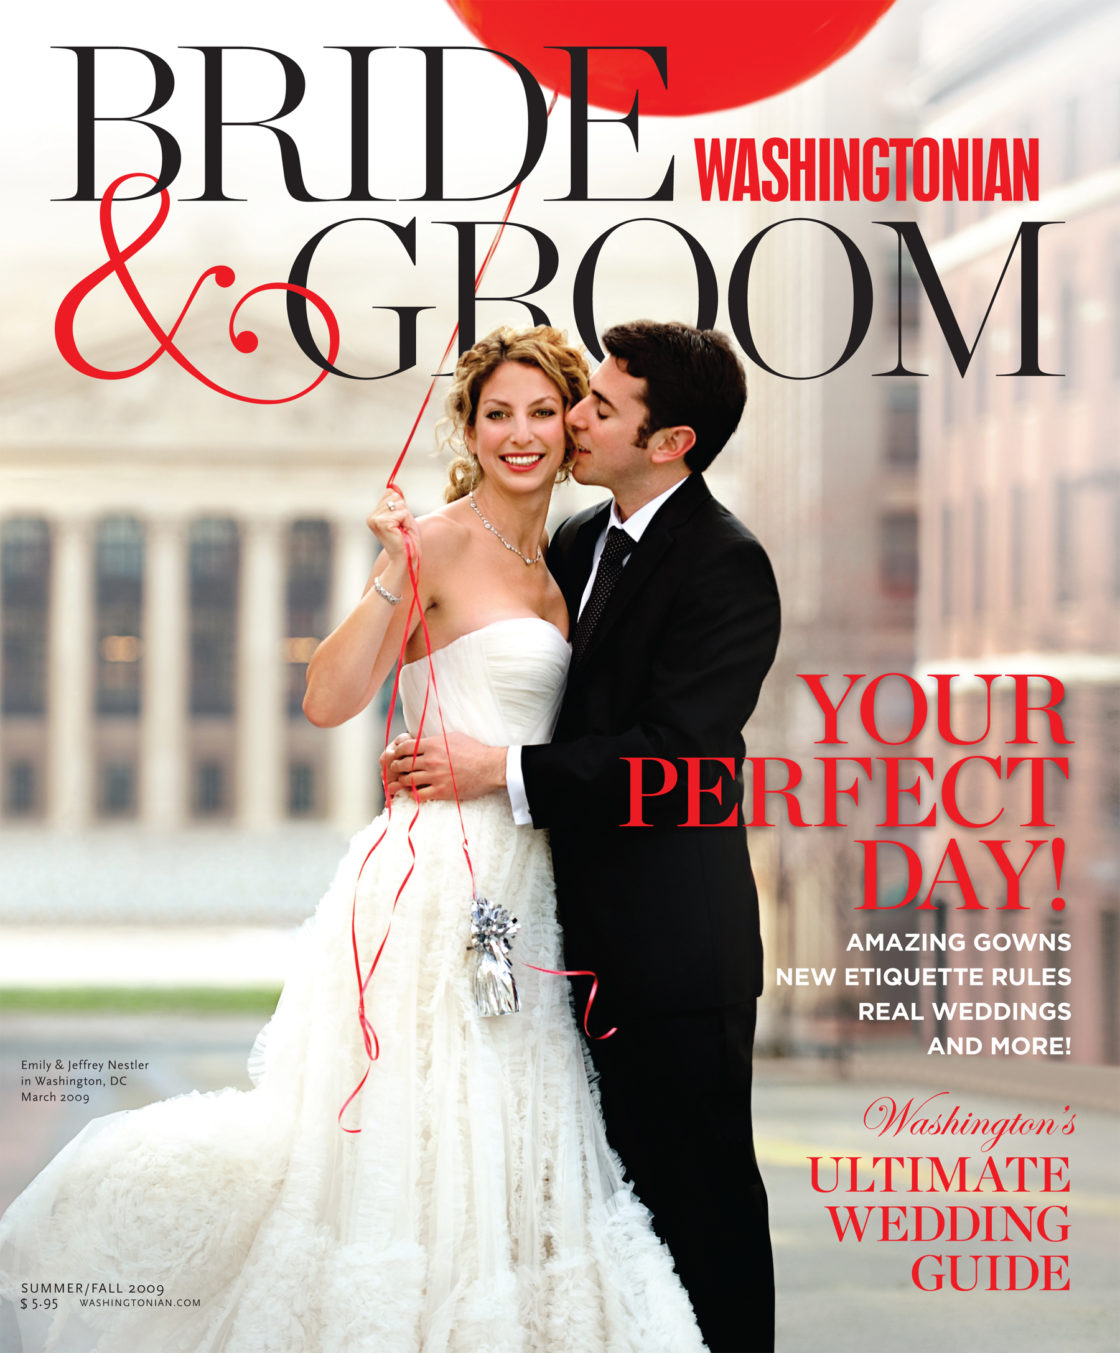 Washingtonian-Bride-and-Groom-Summer-Fall-2009